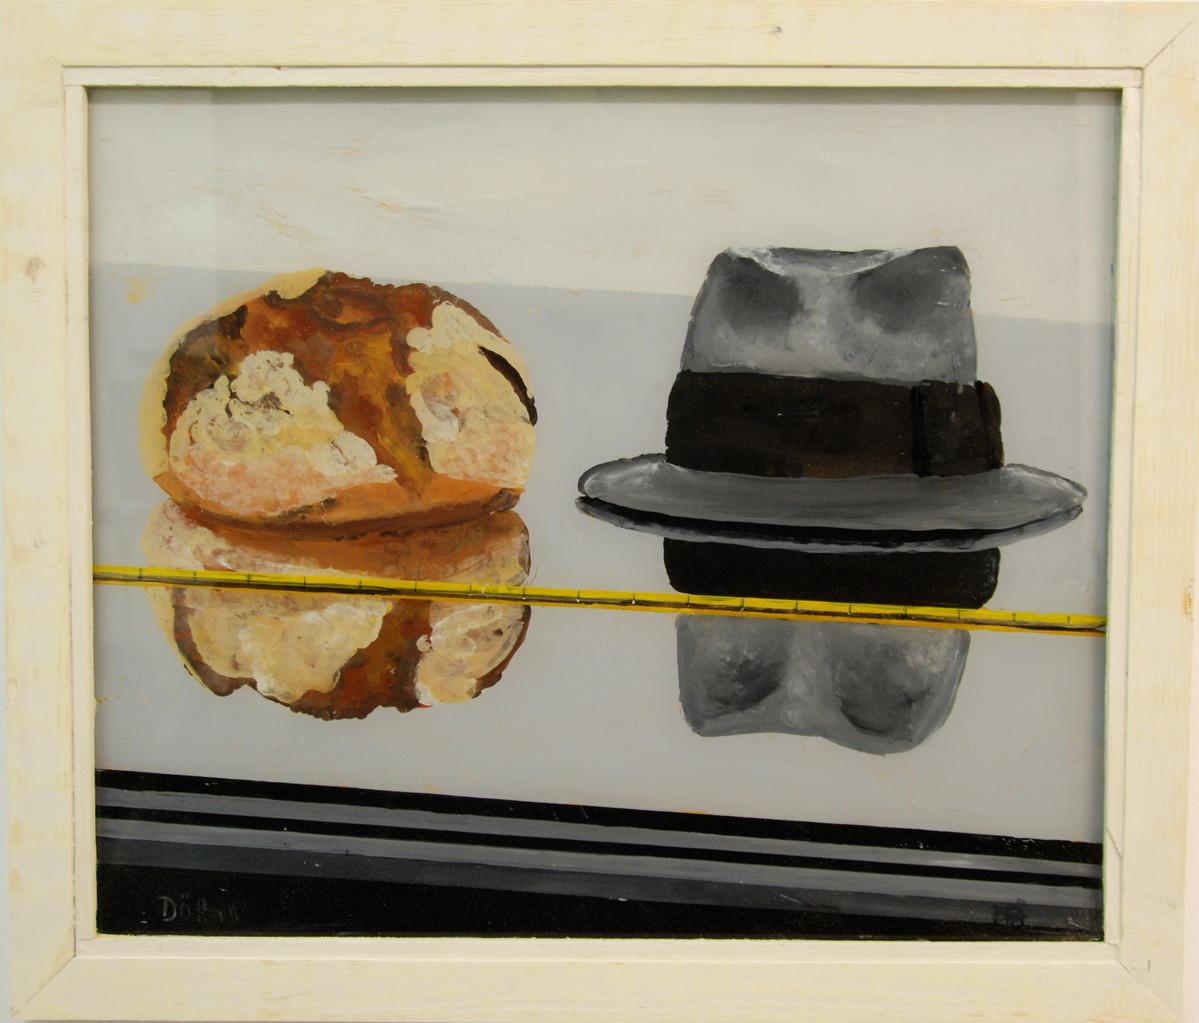 Brot & Hut, 2001, 65 x 44, Hinterglasmalerei, Privatsammlung